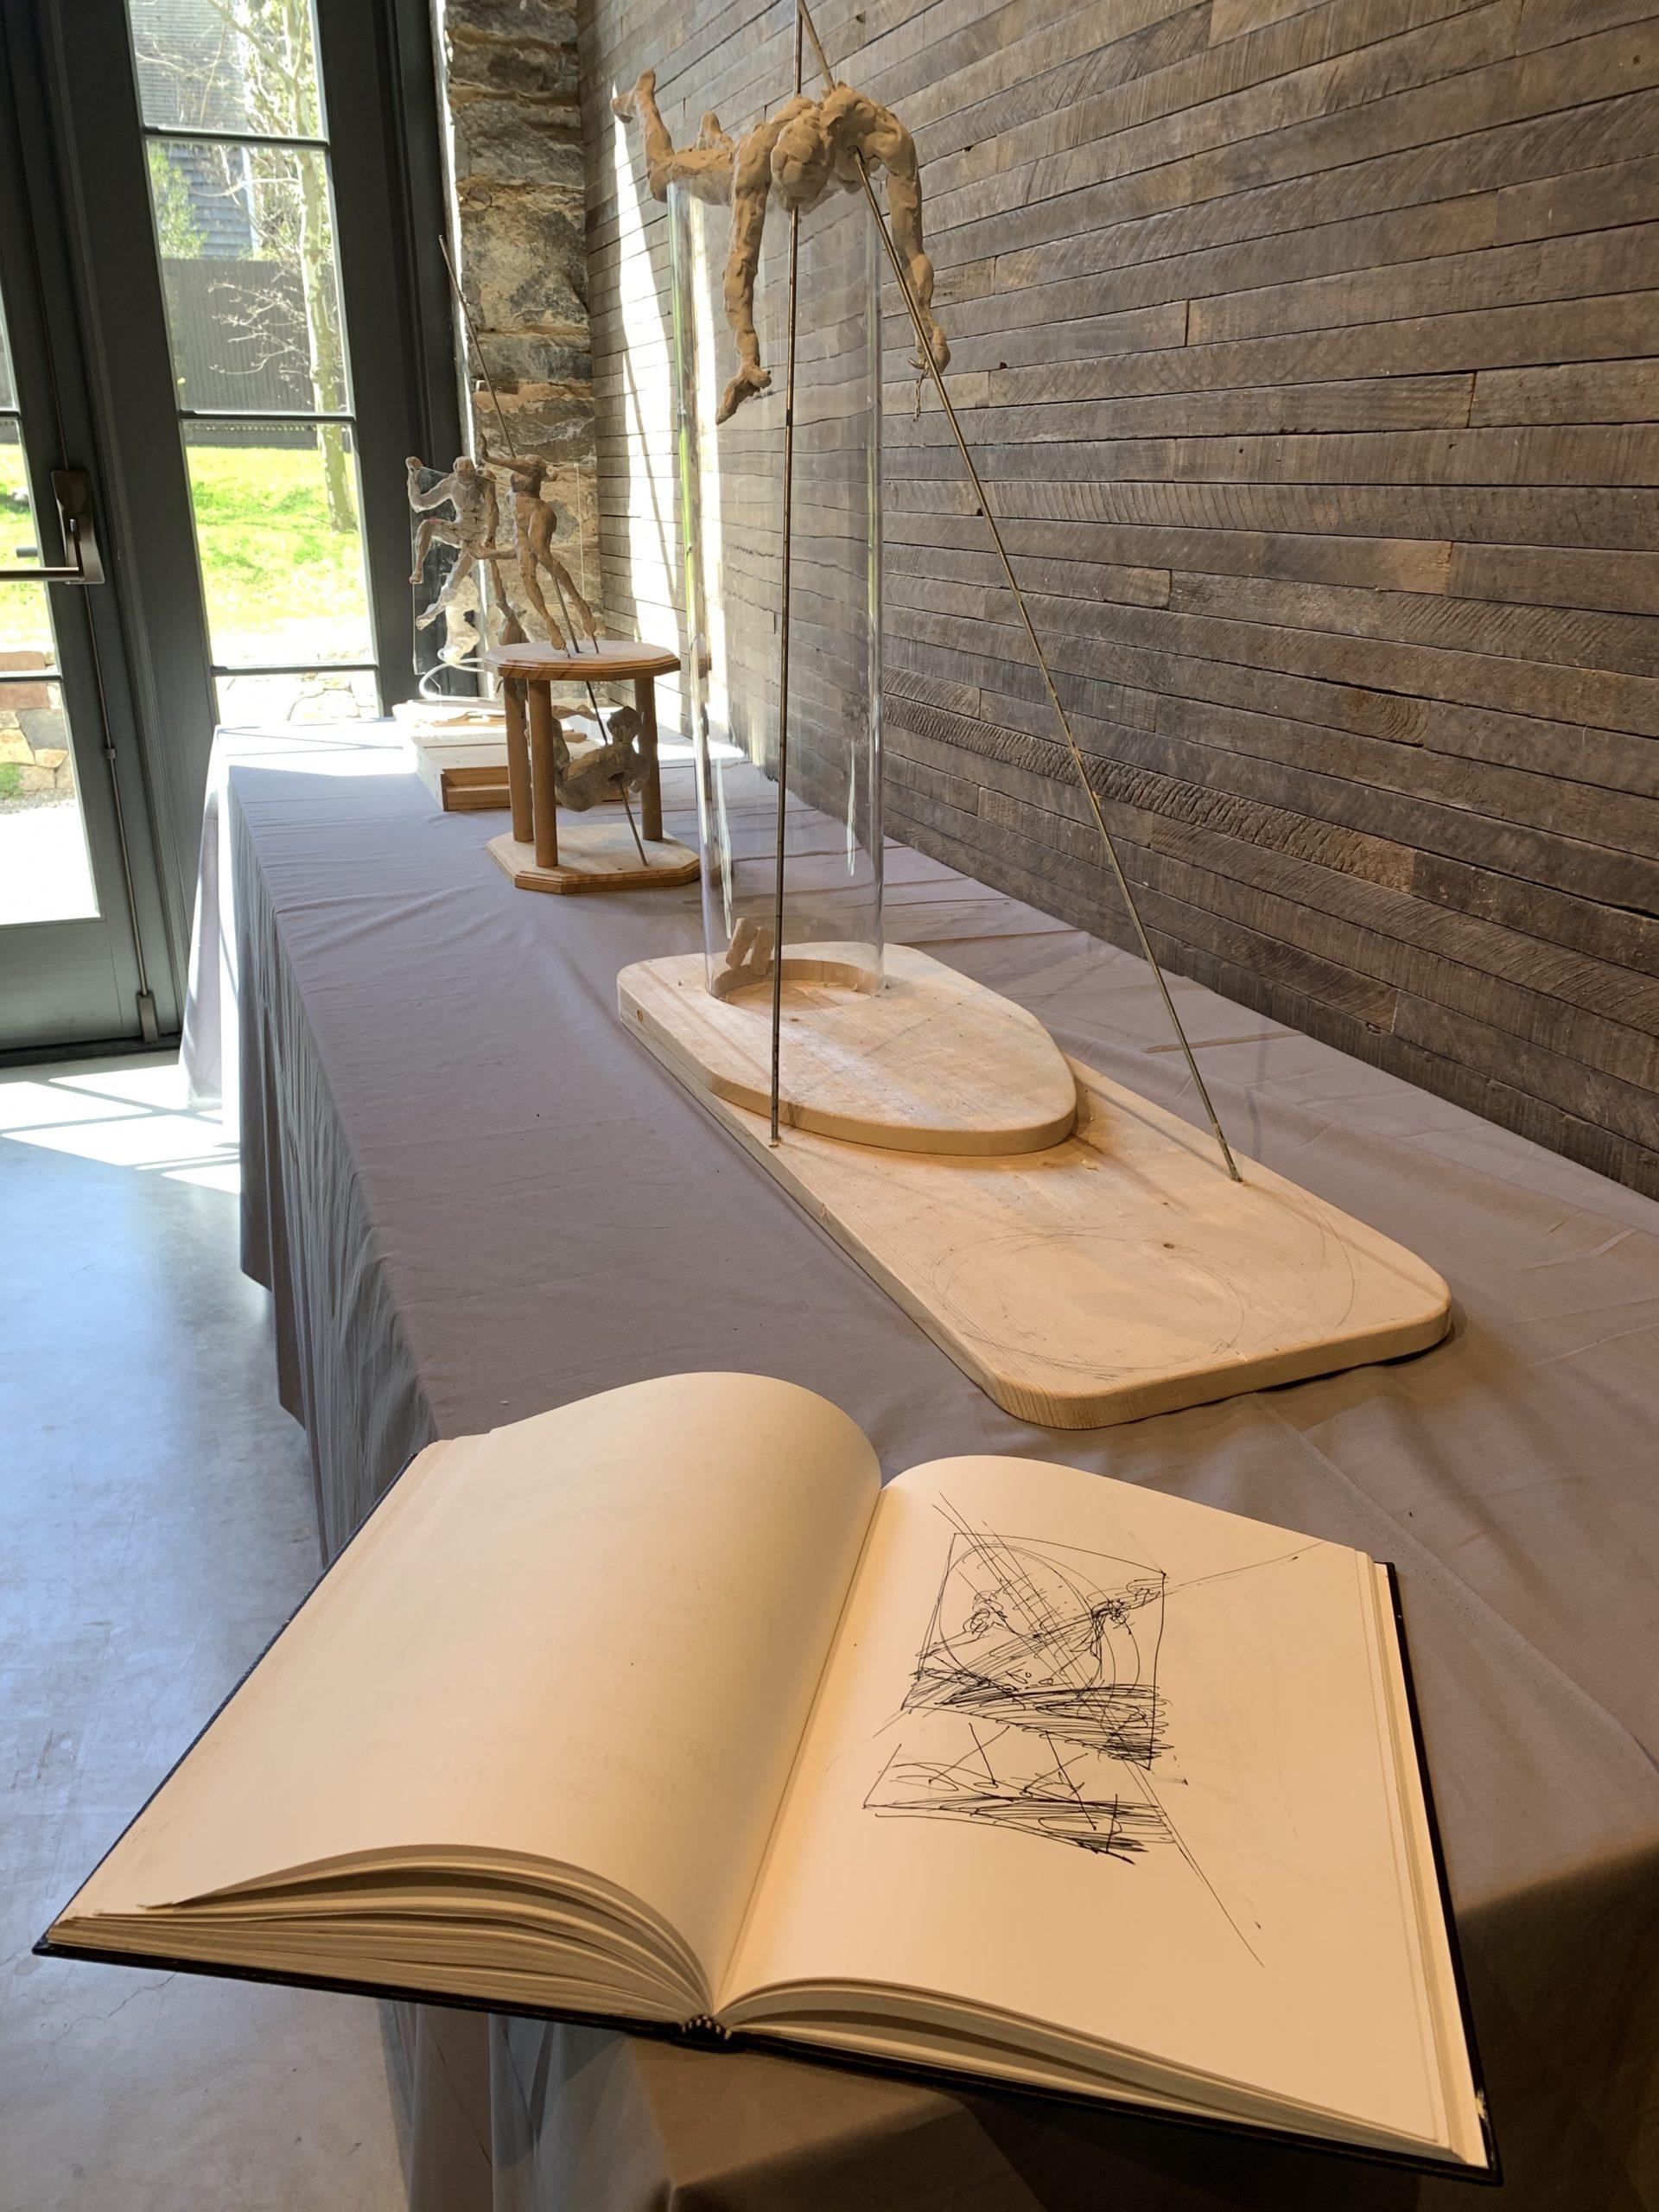 Jim Gingerich sculpture and sketch book.